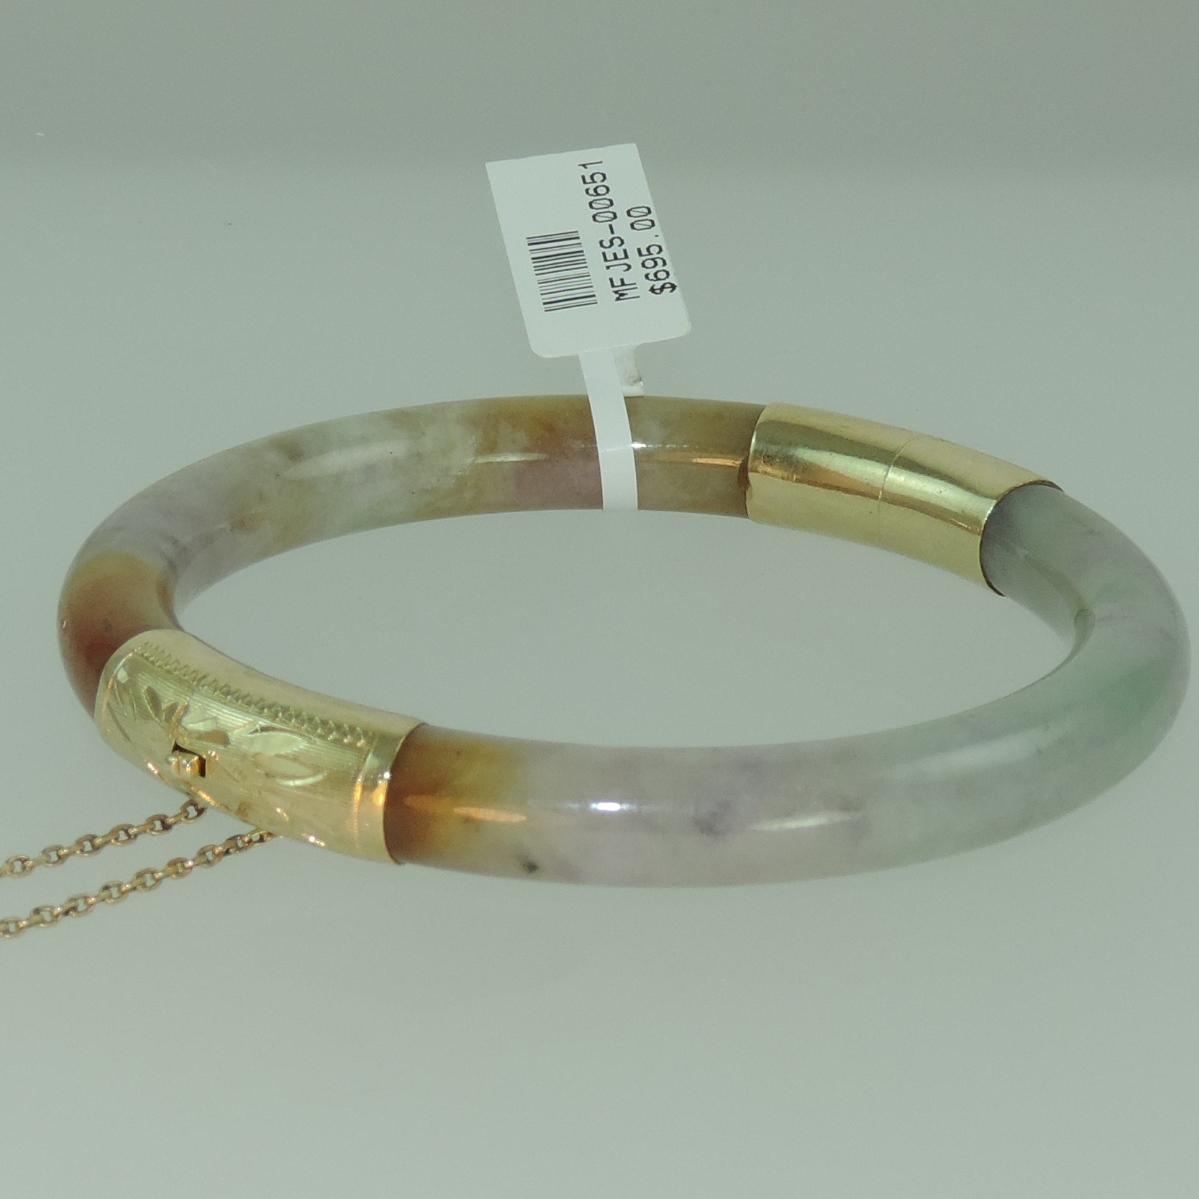 Lavendar Jadeite Hinged Bangle in 14k Yellow Gold